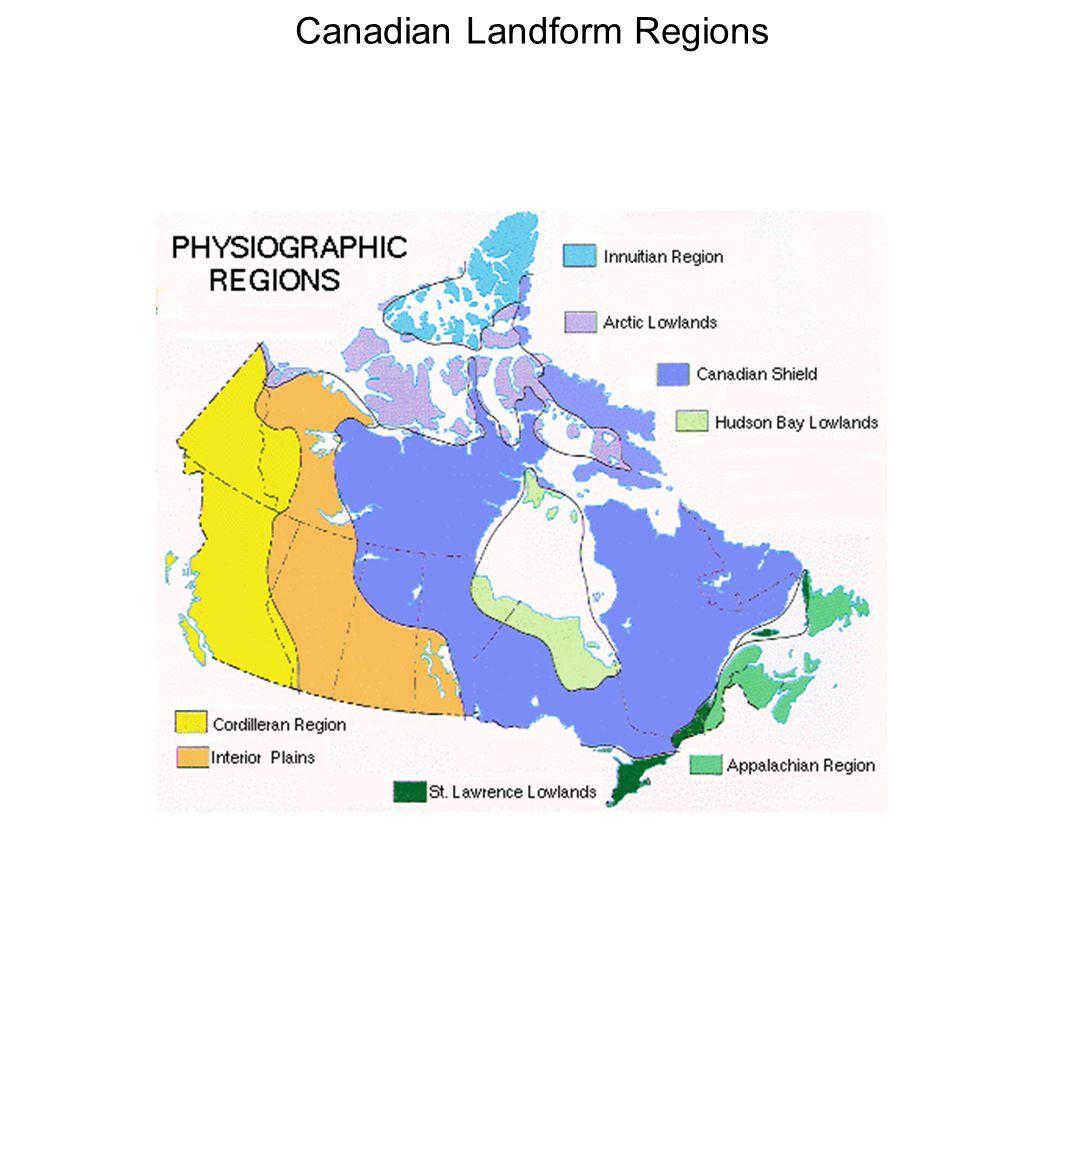 Canadian Landform Regions